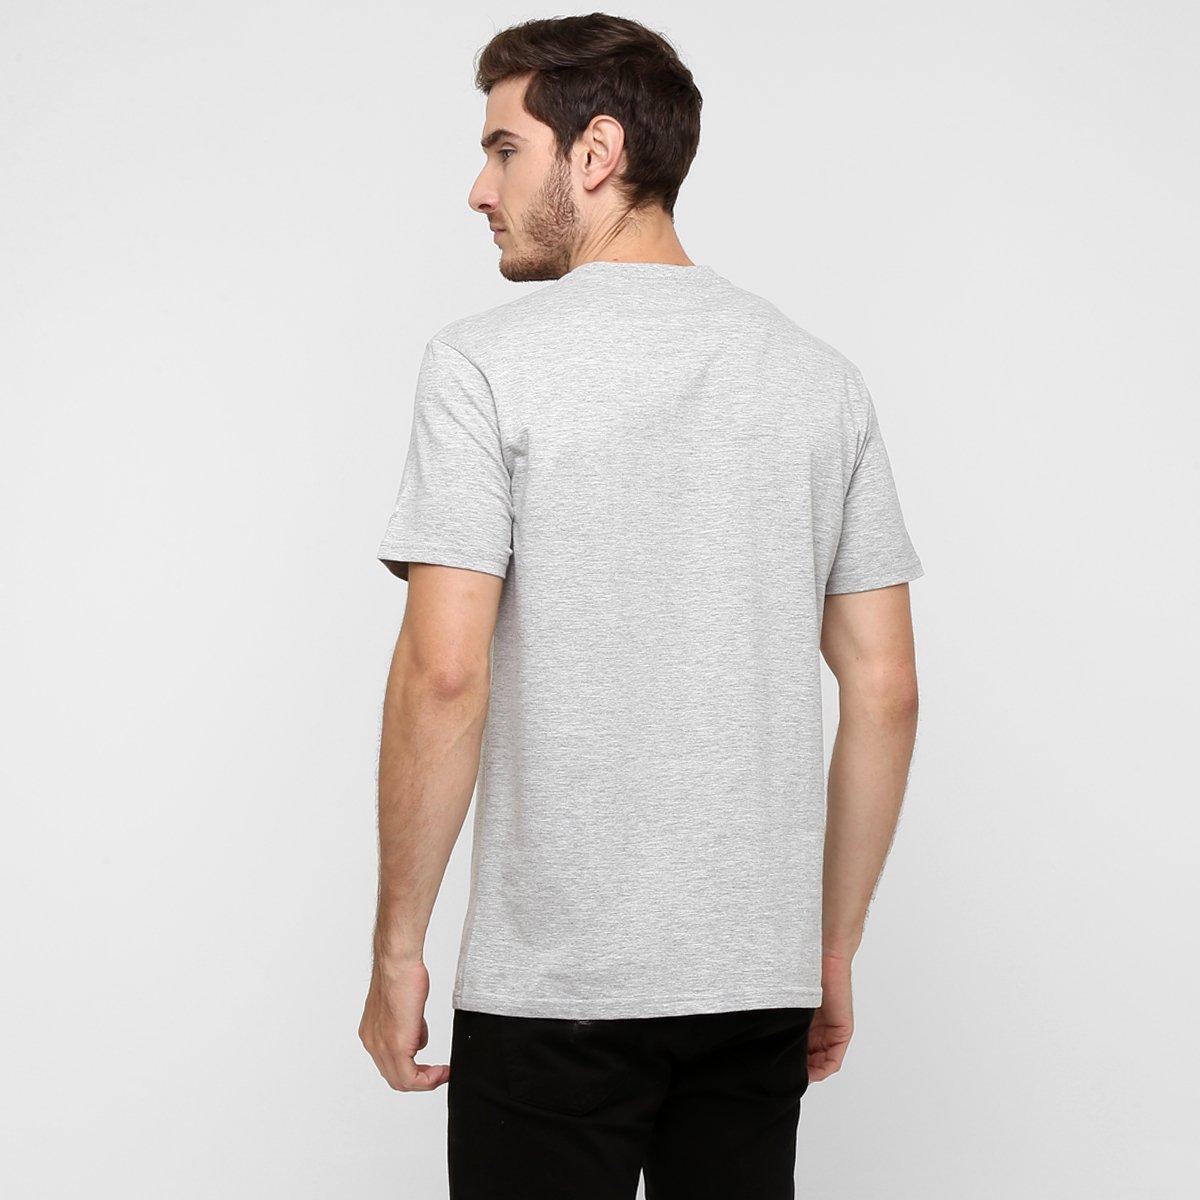 308b98299ce98 Camiseta New Era MLB Nac Concreto 15 New York Yankees - Compre Agora ...